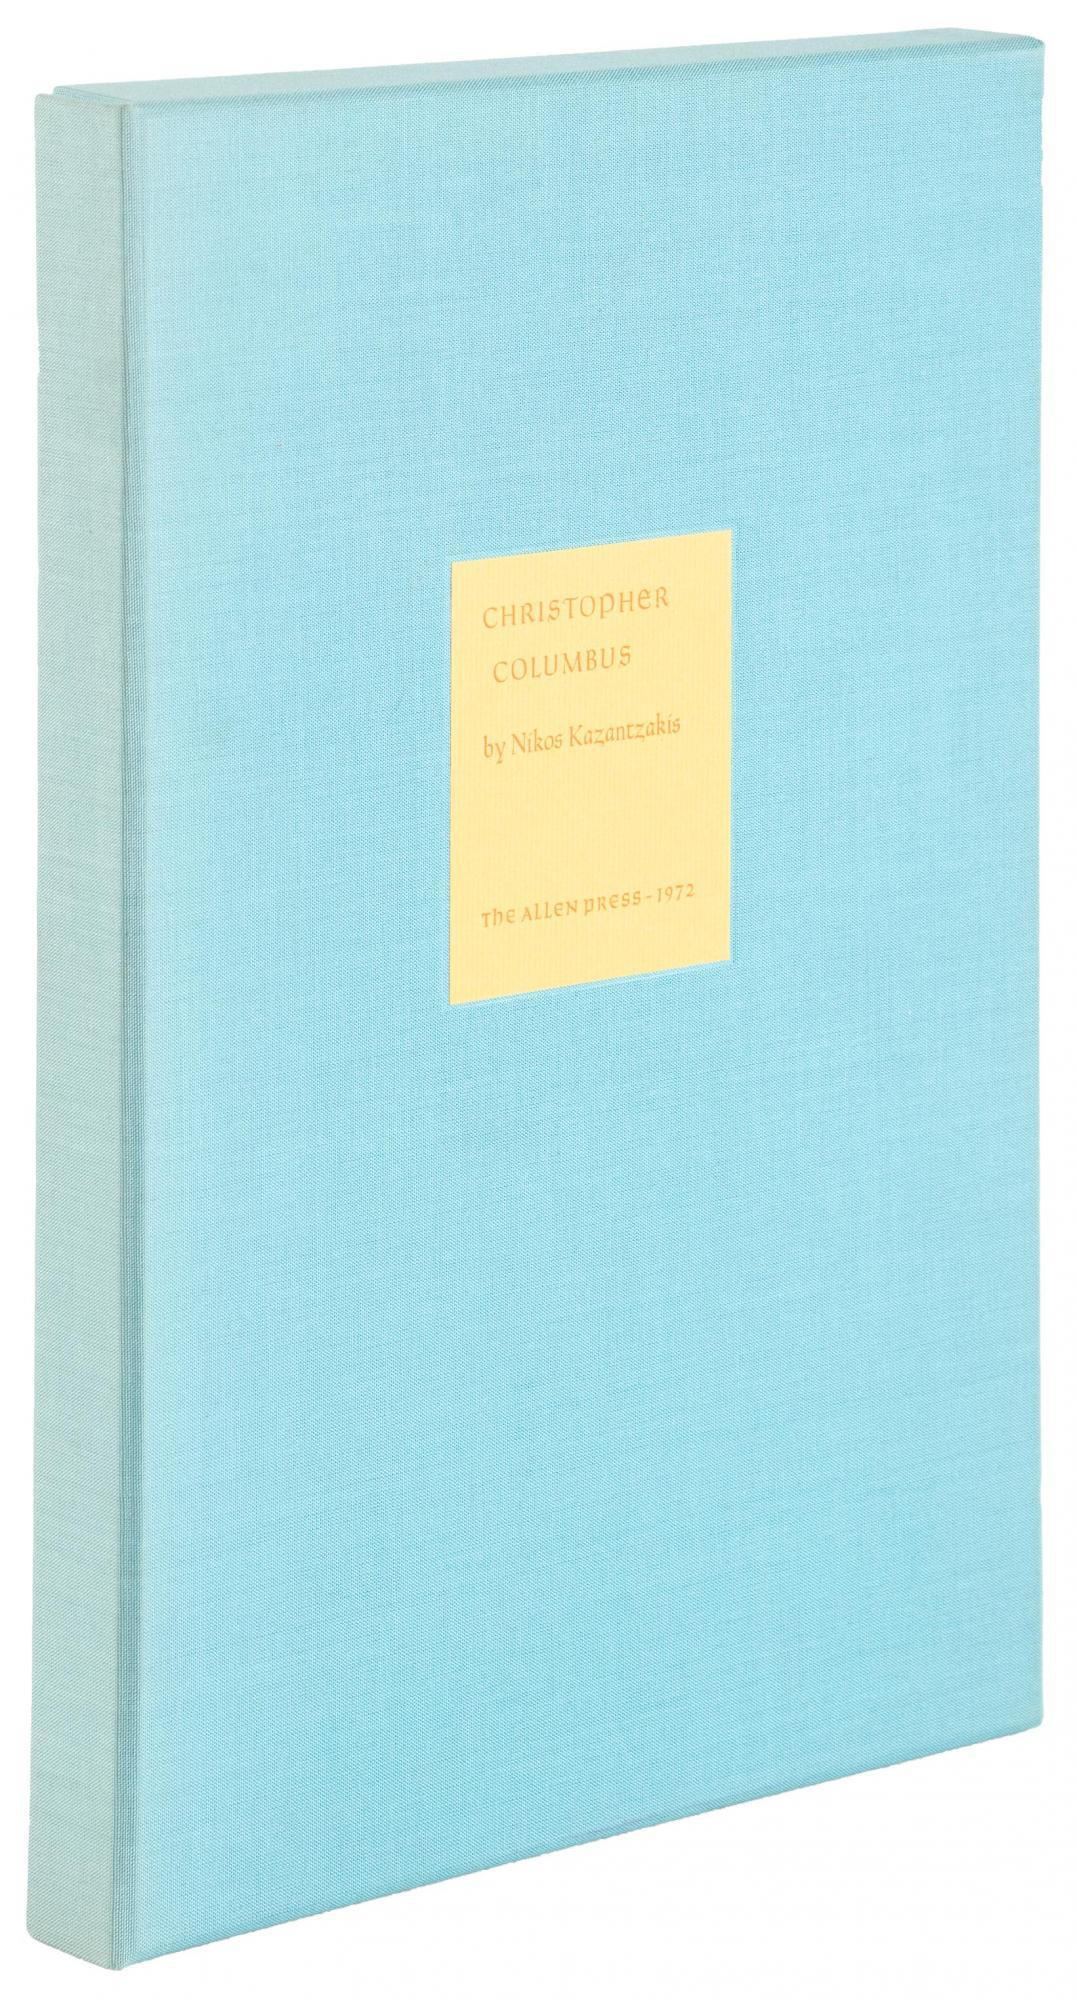 Fine Press - Fine Bindings - Fine Books